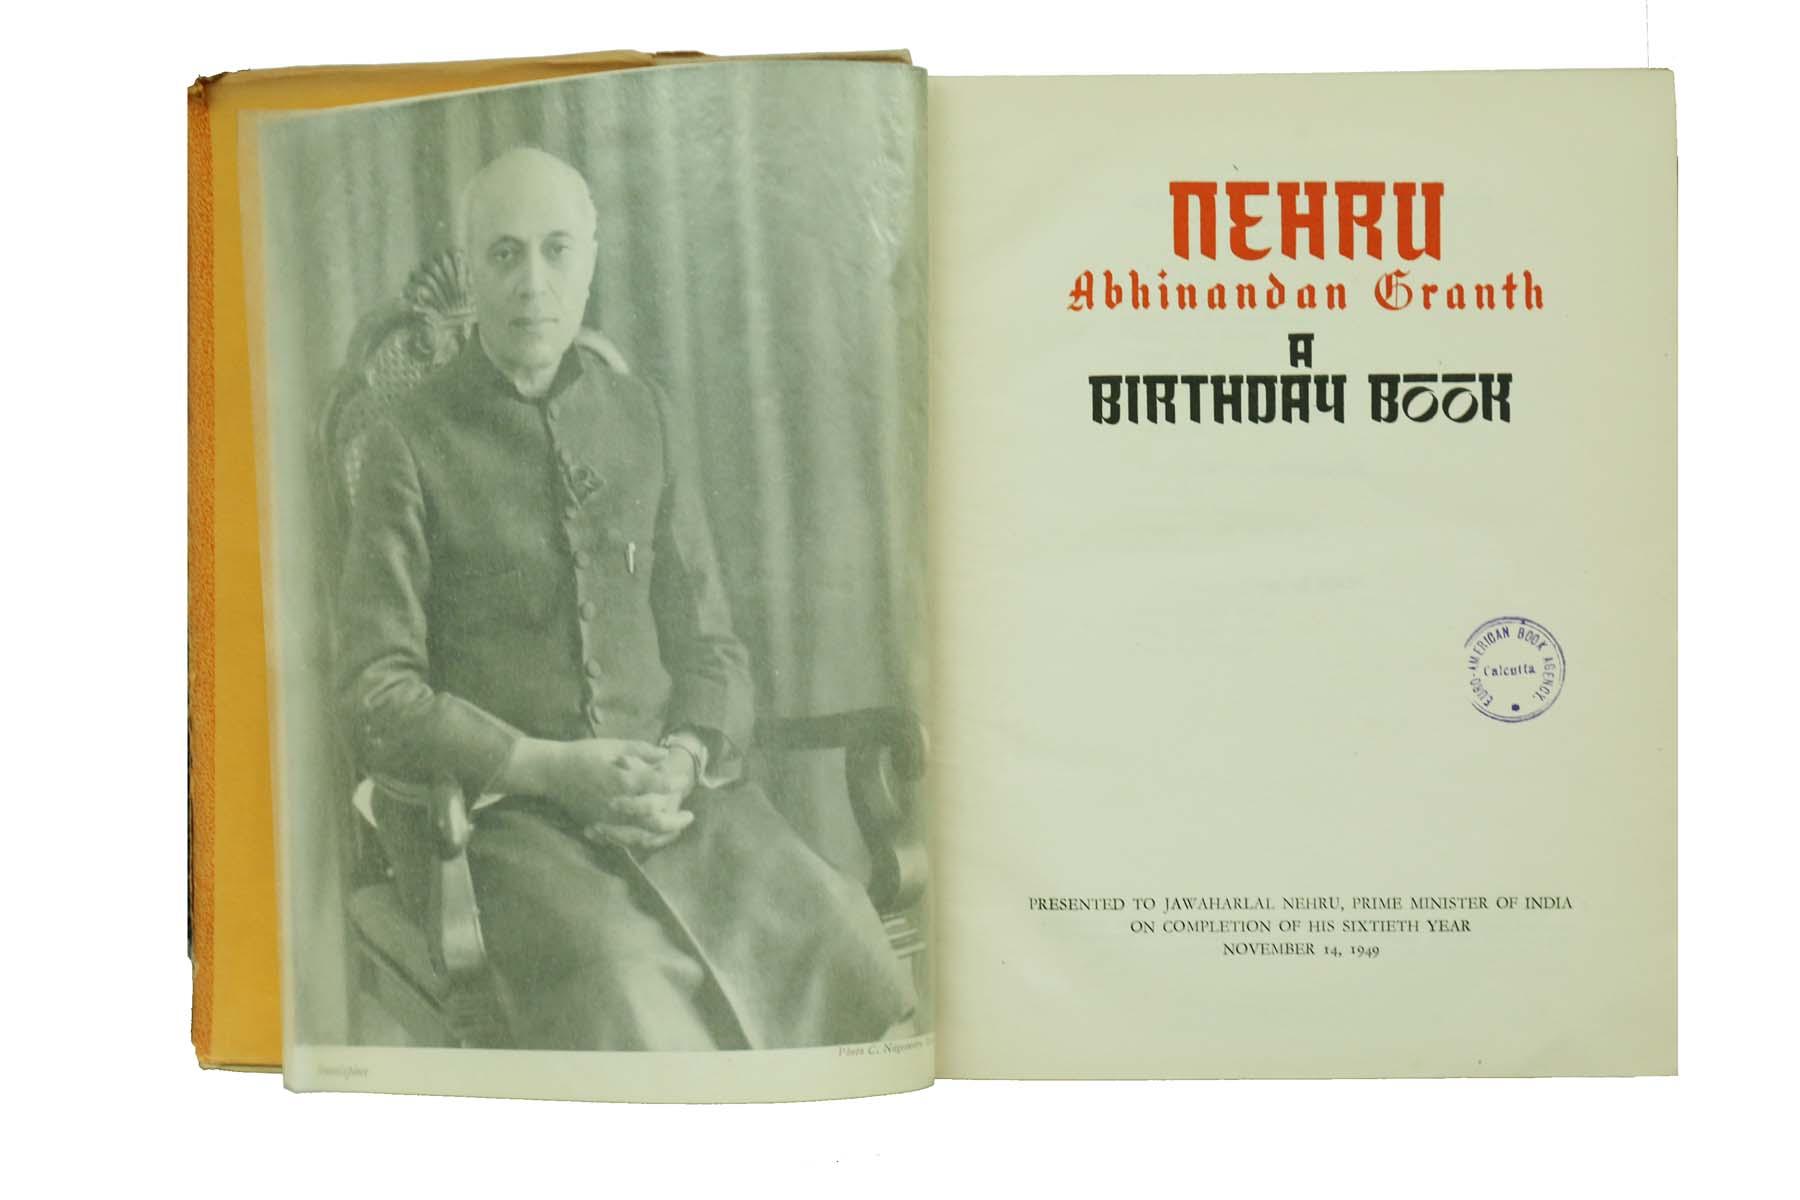 NEHRU BIRTHDAY BOOK